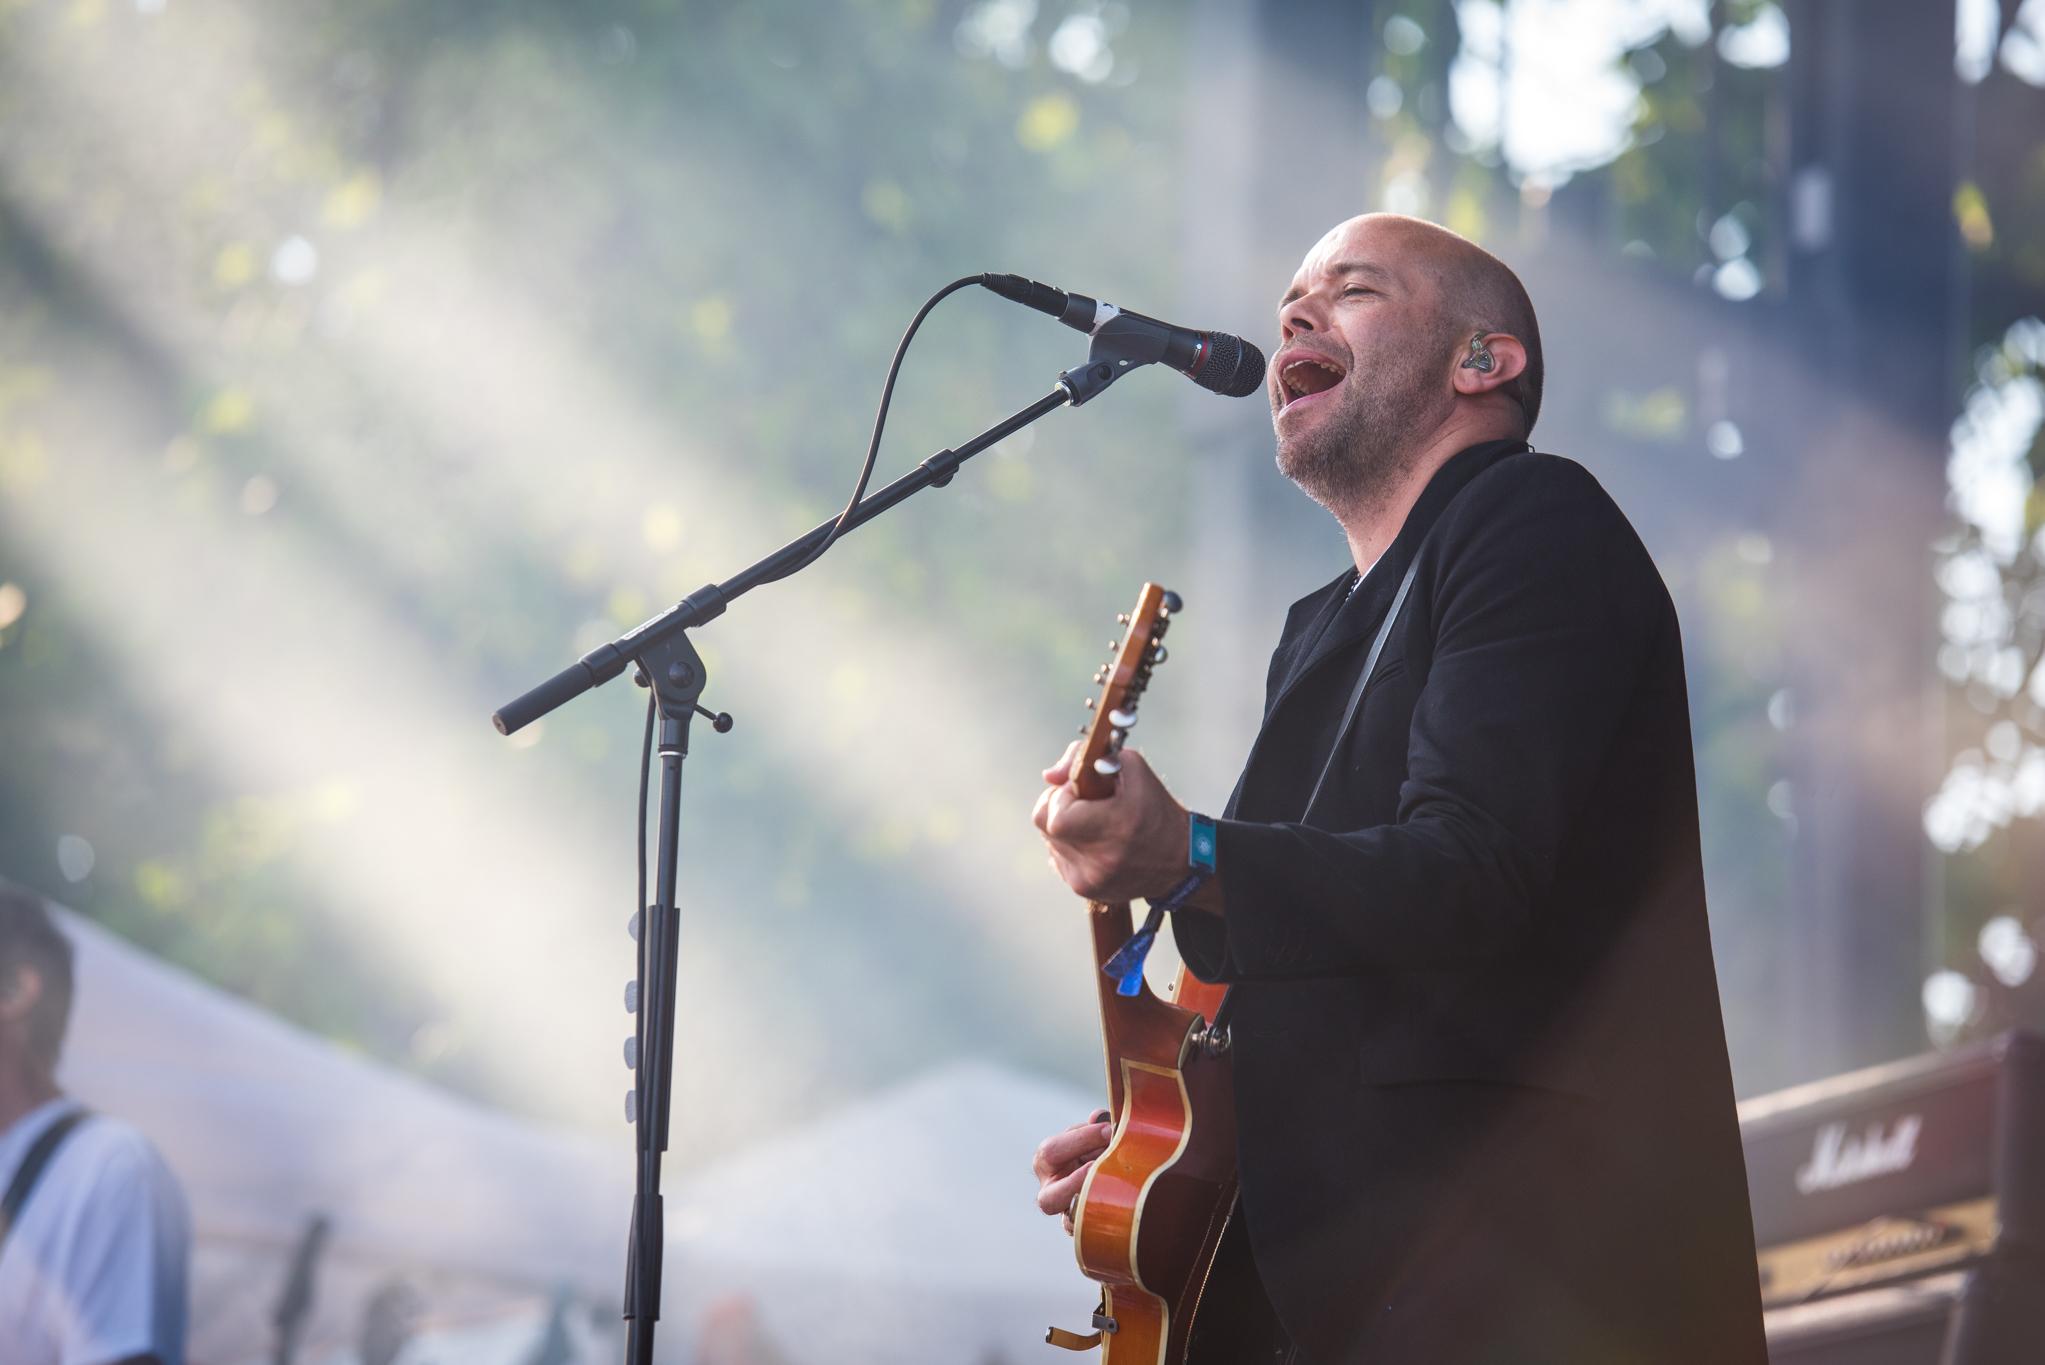 Pitchfork Music Festival 2017, Neal O'Bryan, ride